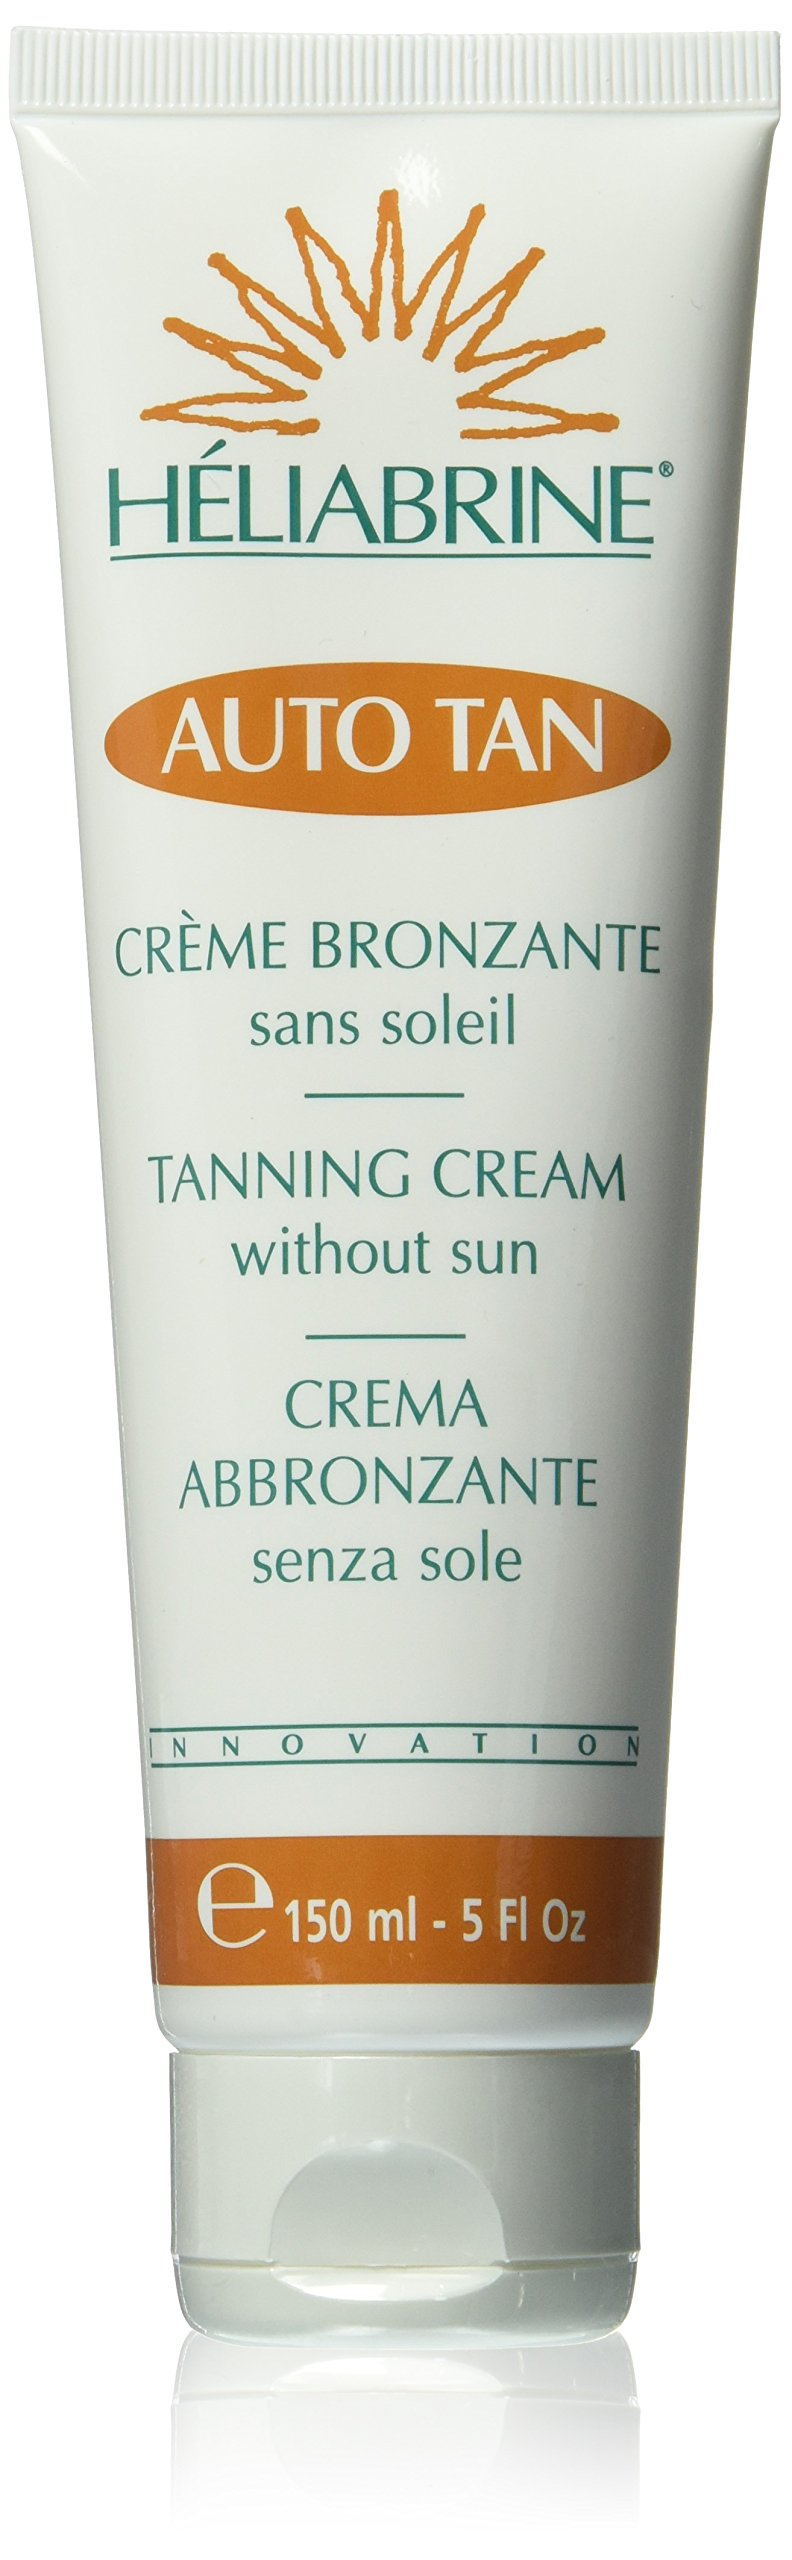 Heliabrine Self Tanning Auto Tan Cream by Heliabrine